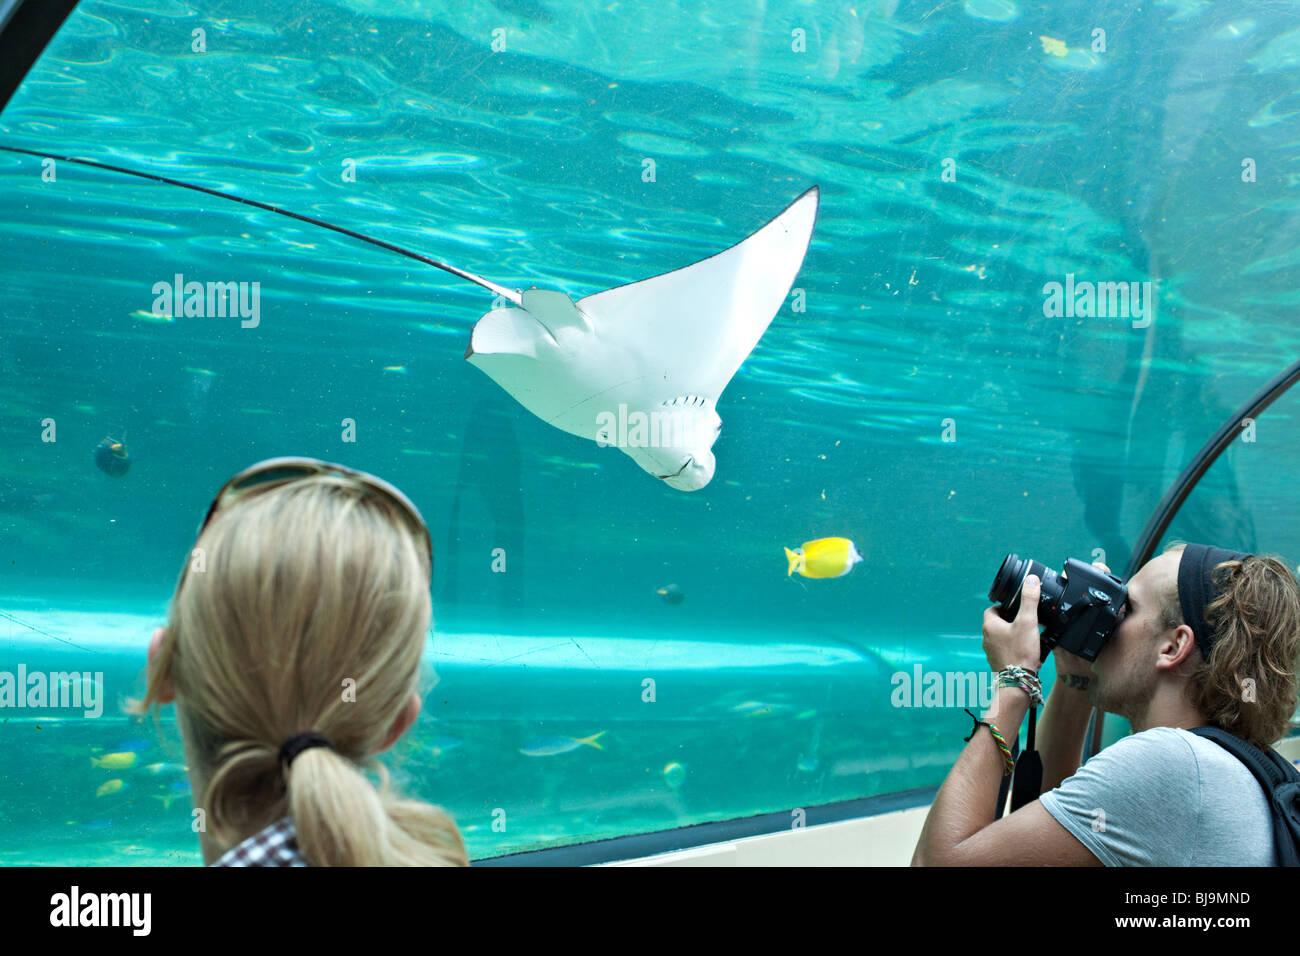 Tourists photographing  stingrays in Sydney Aquarium, Australia - Stock Image